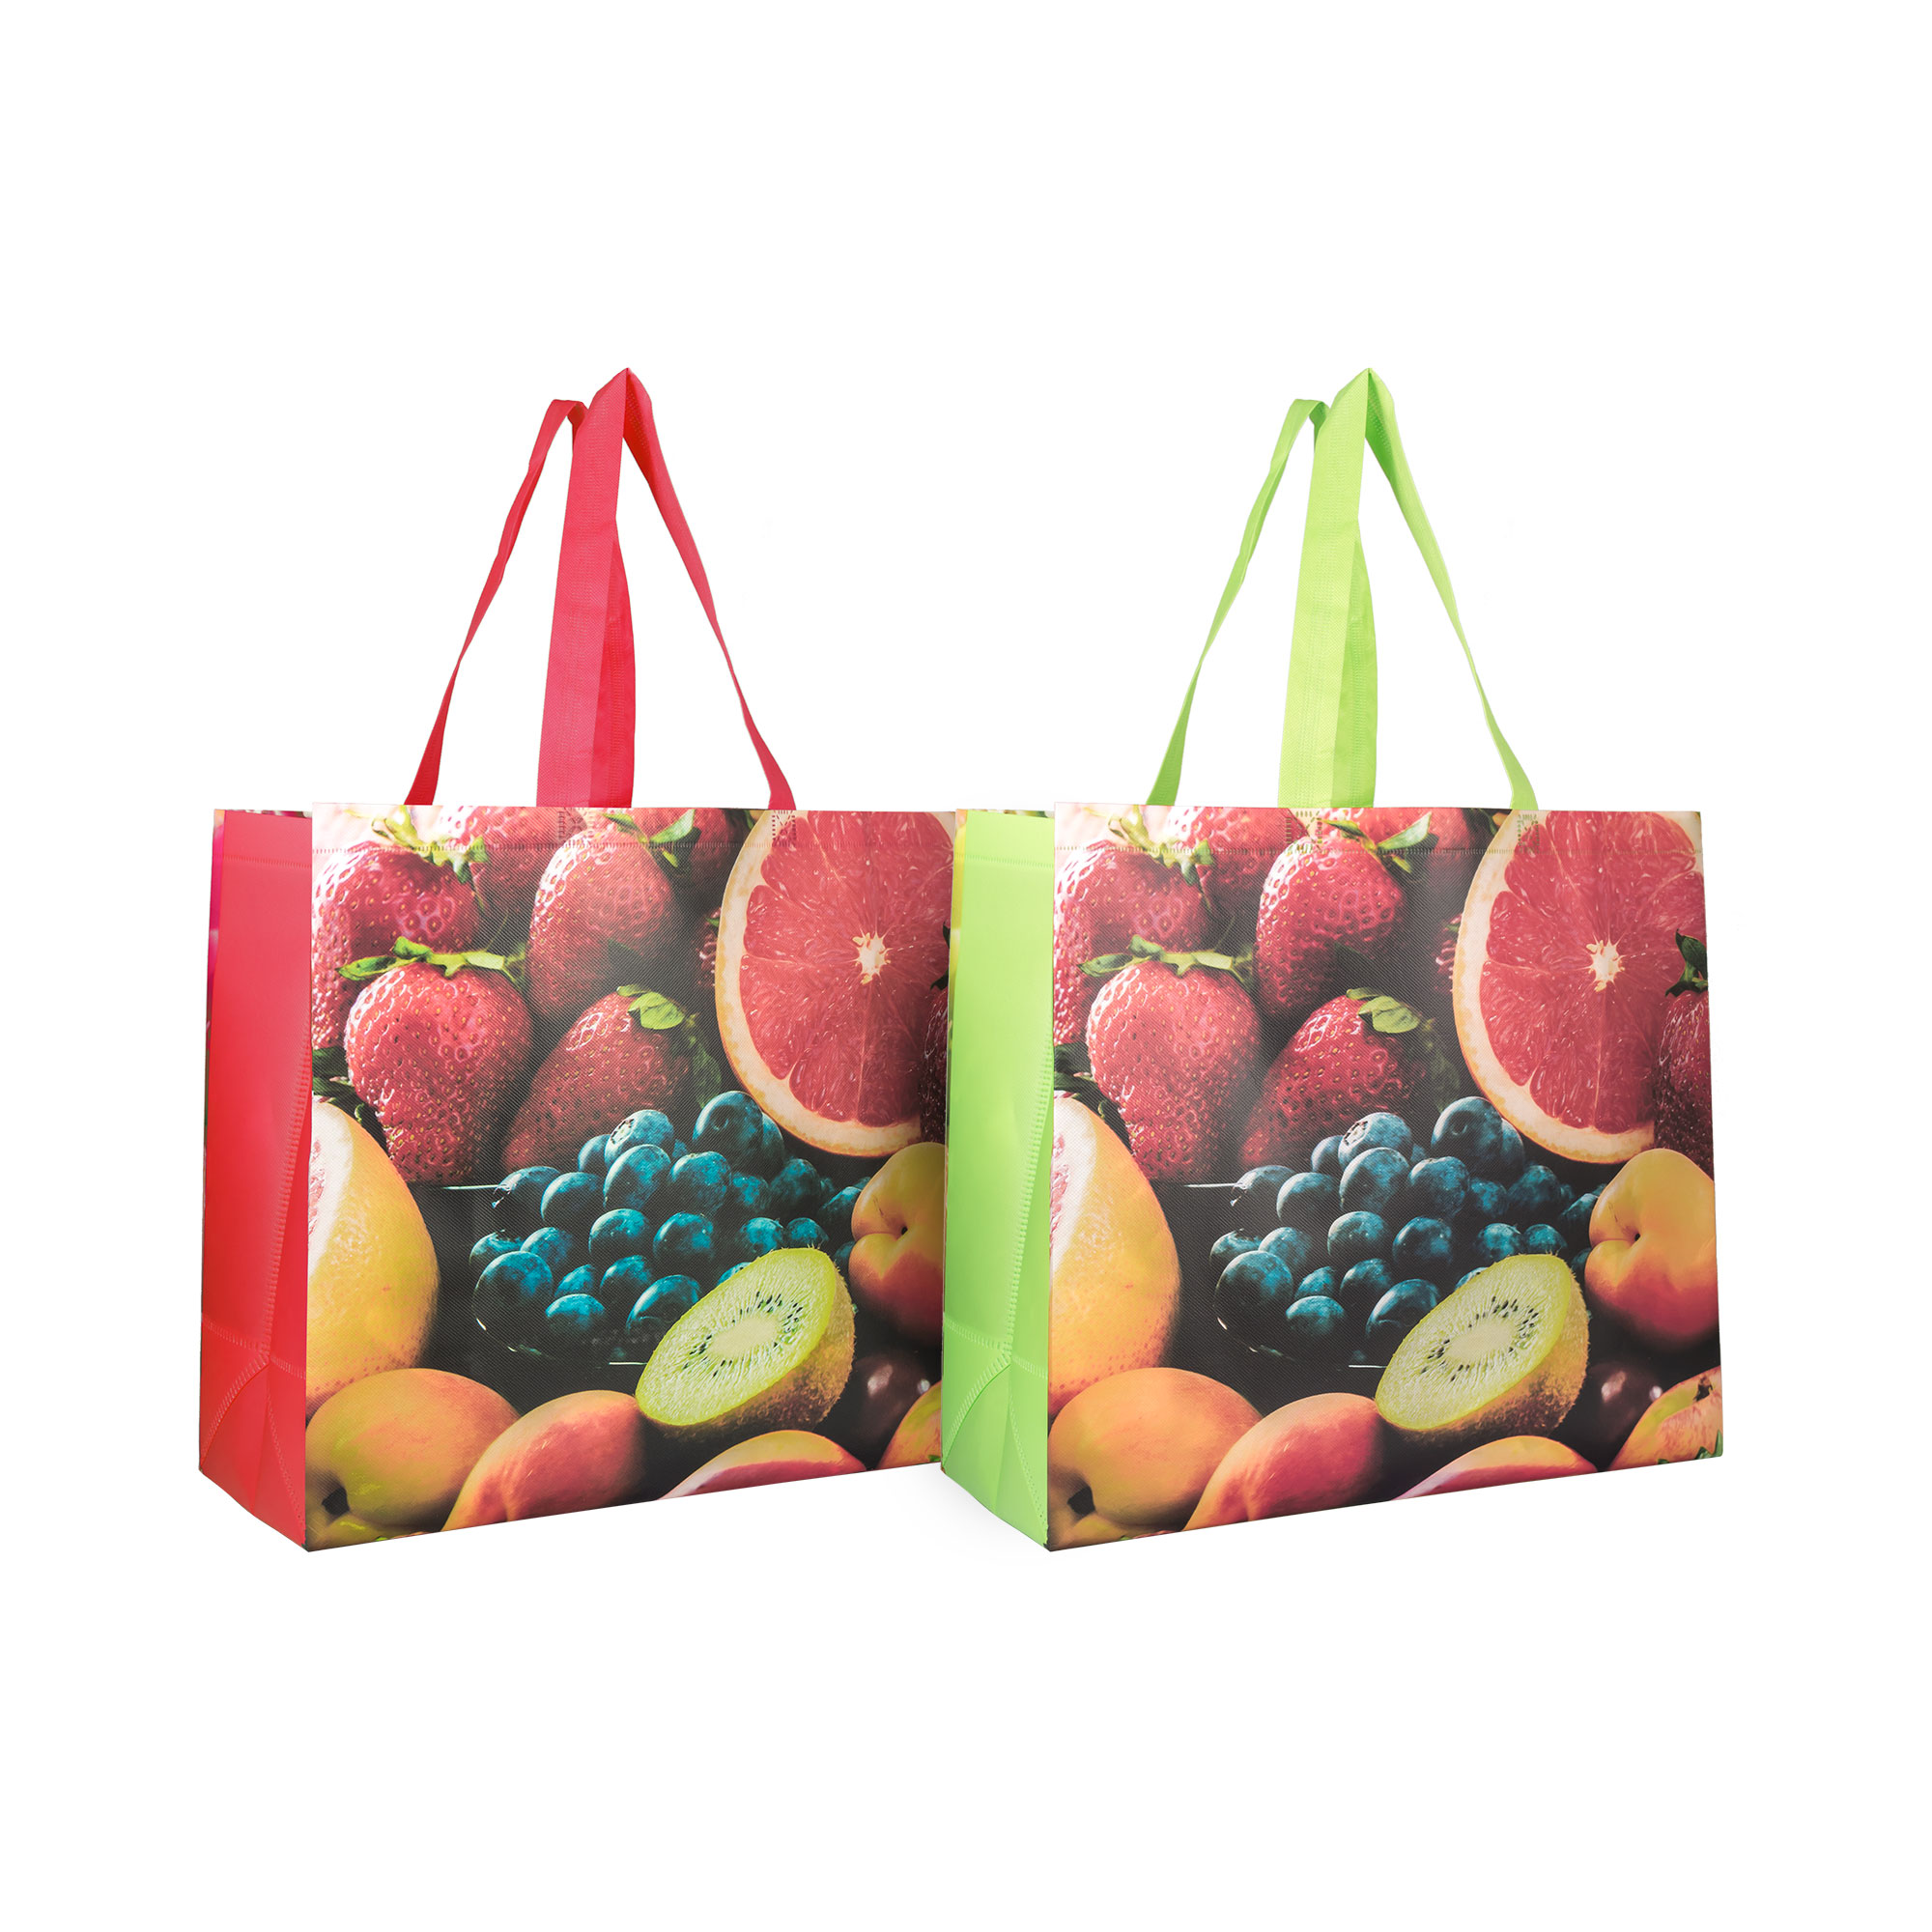 10bee7f10f7 Accessories :: Τσάντες & Πορτοφόλια :: Τσάντα οικολογική για ψώνια ...